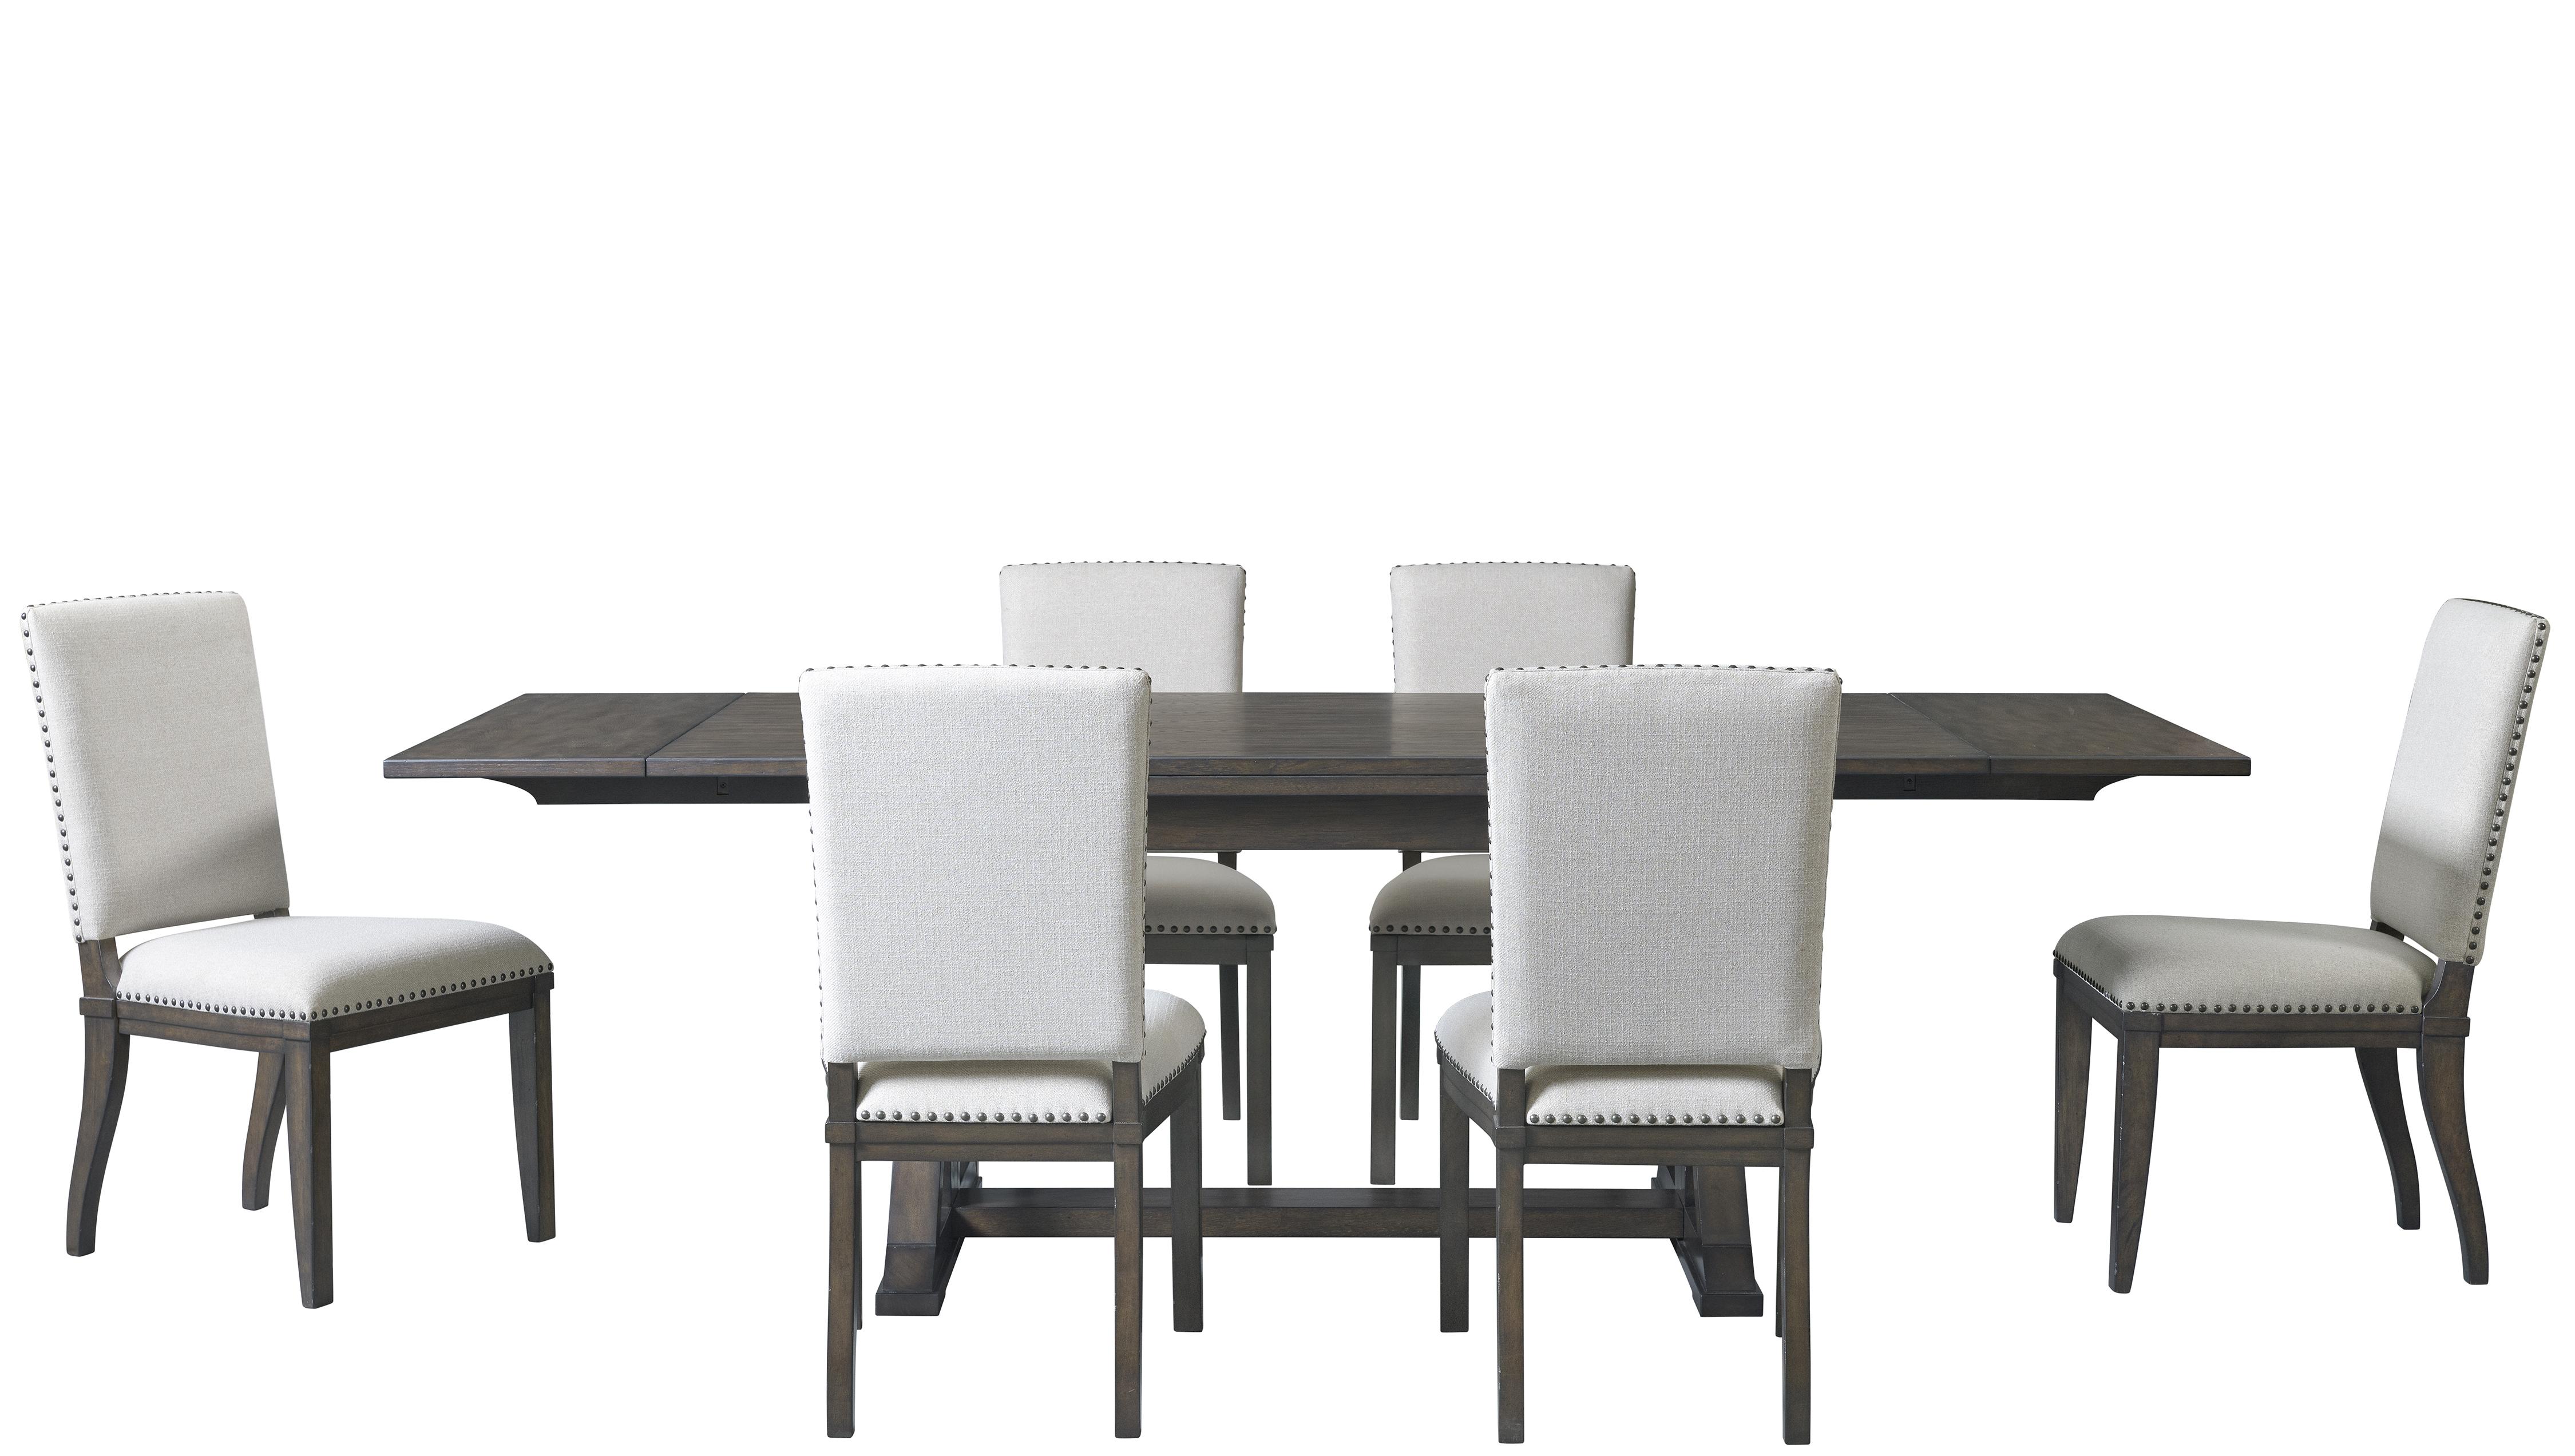 Forsyth 7-Piece Dining Set by Riverside Furniture at Wayside Furniture